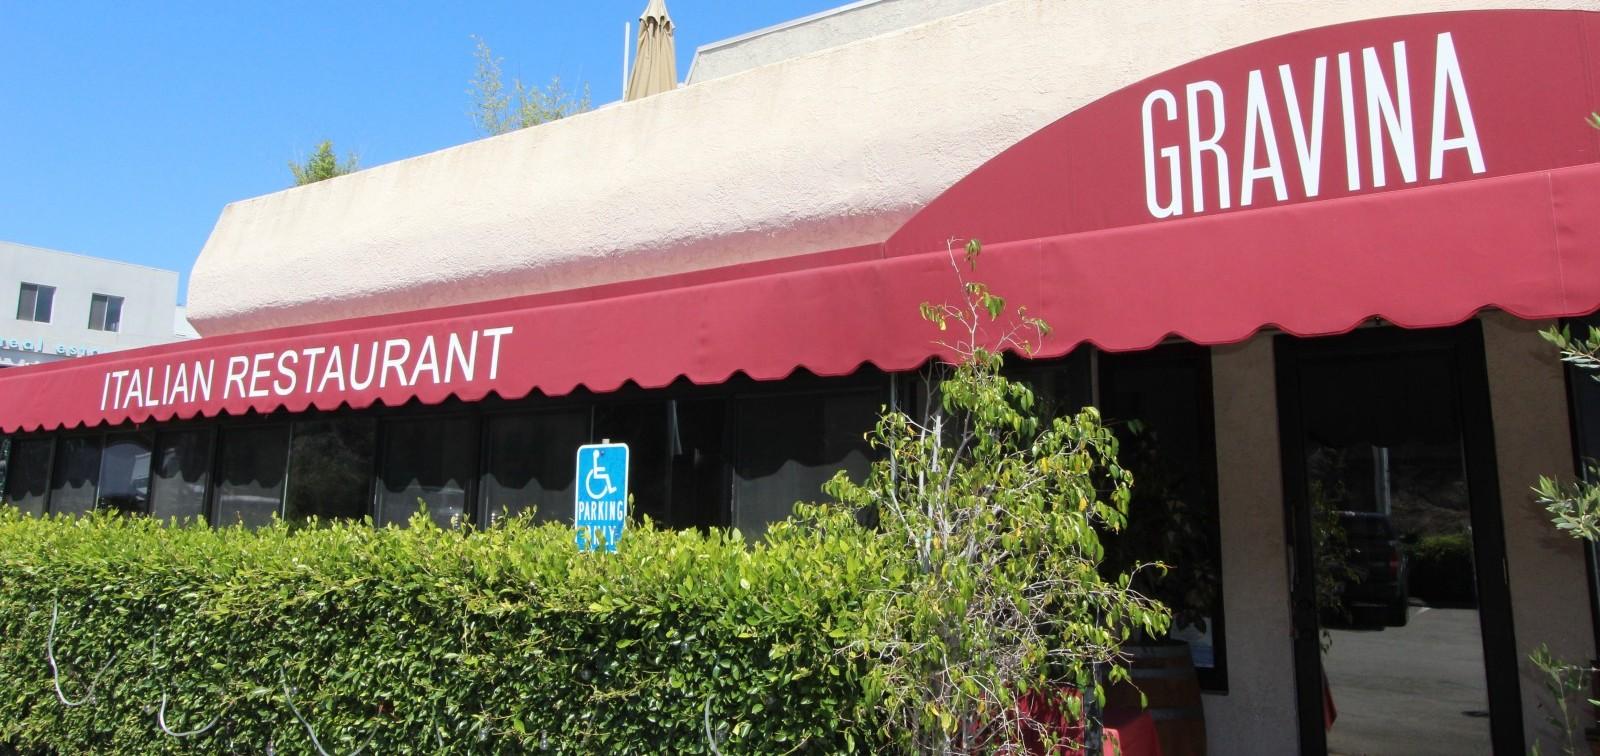 gravina-restaurant-malibu_all-things-malibu